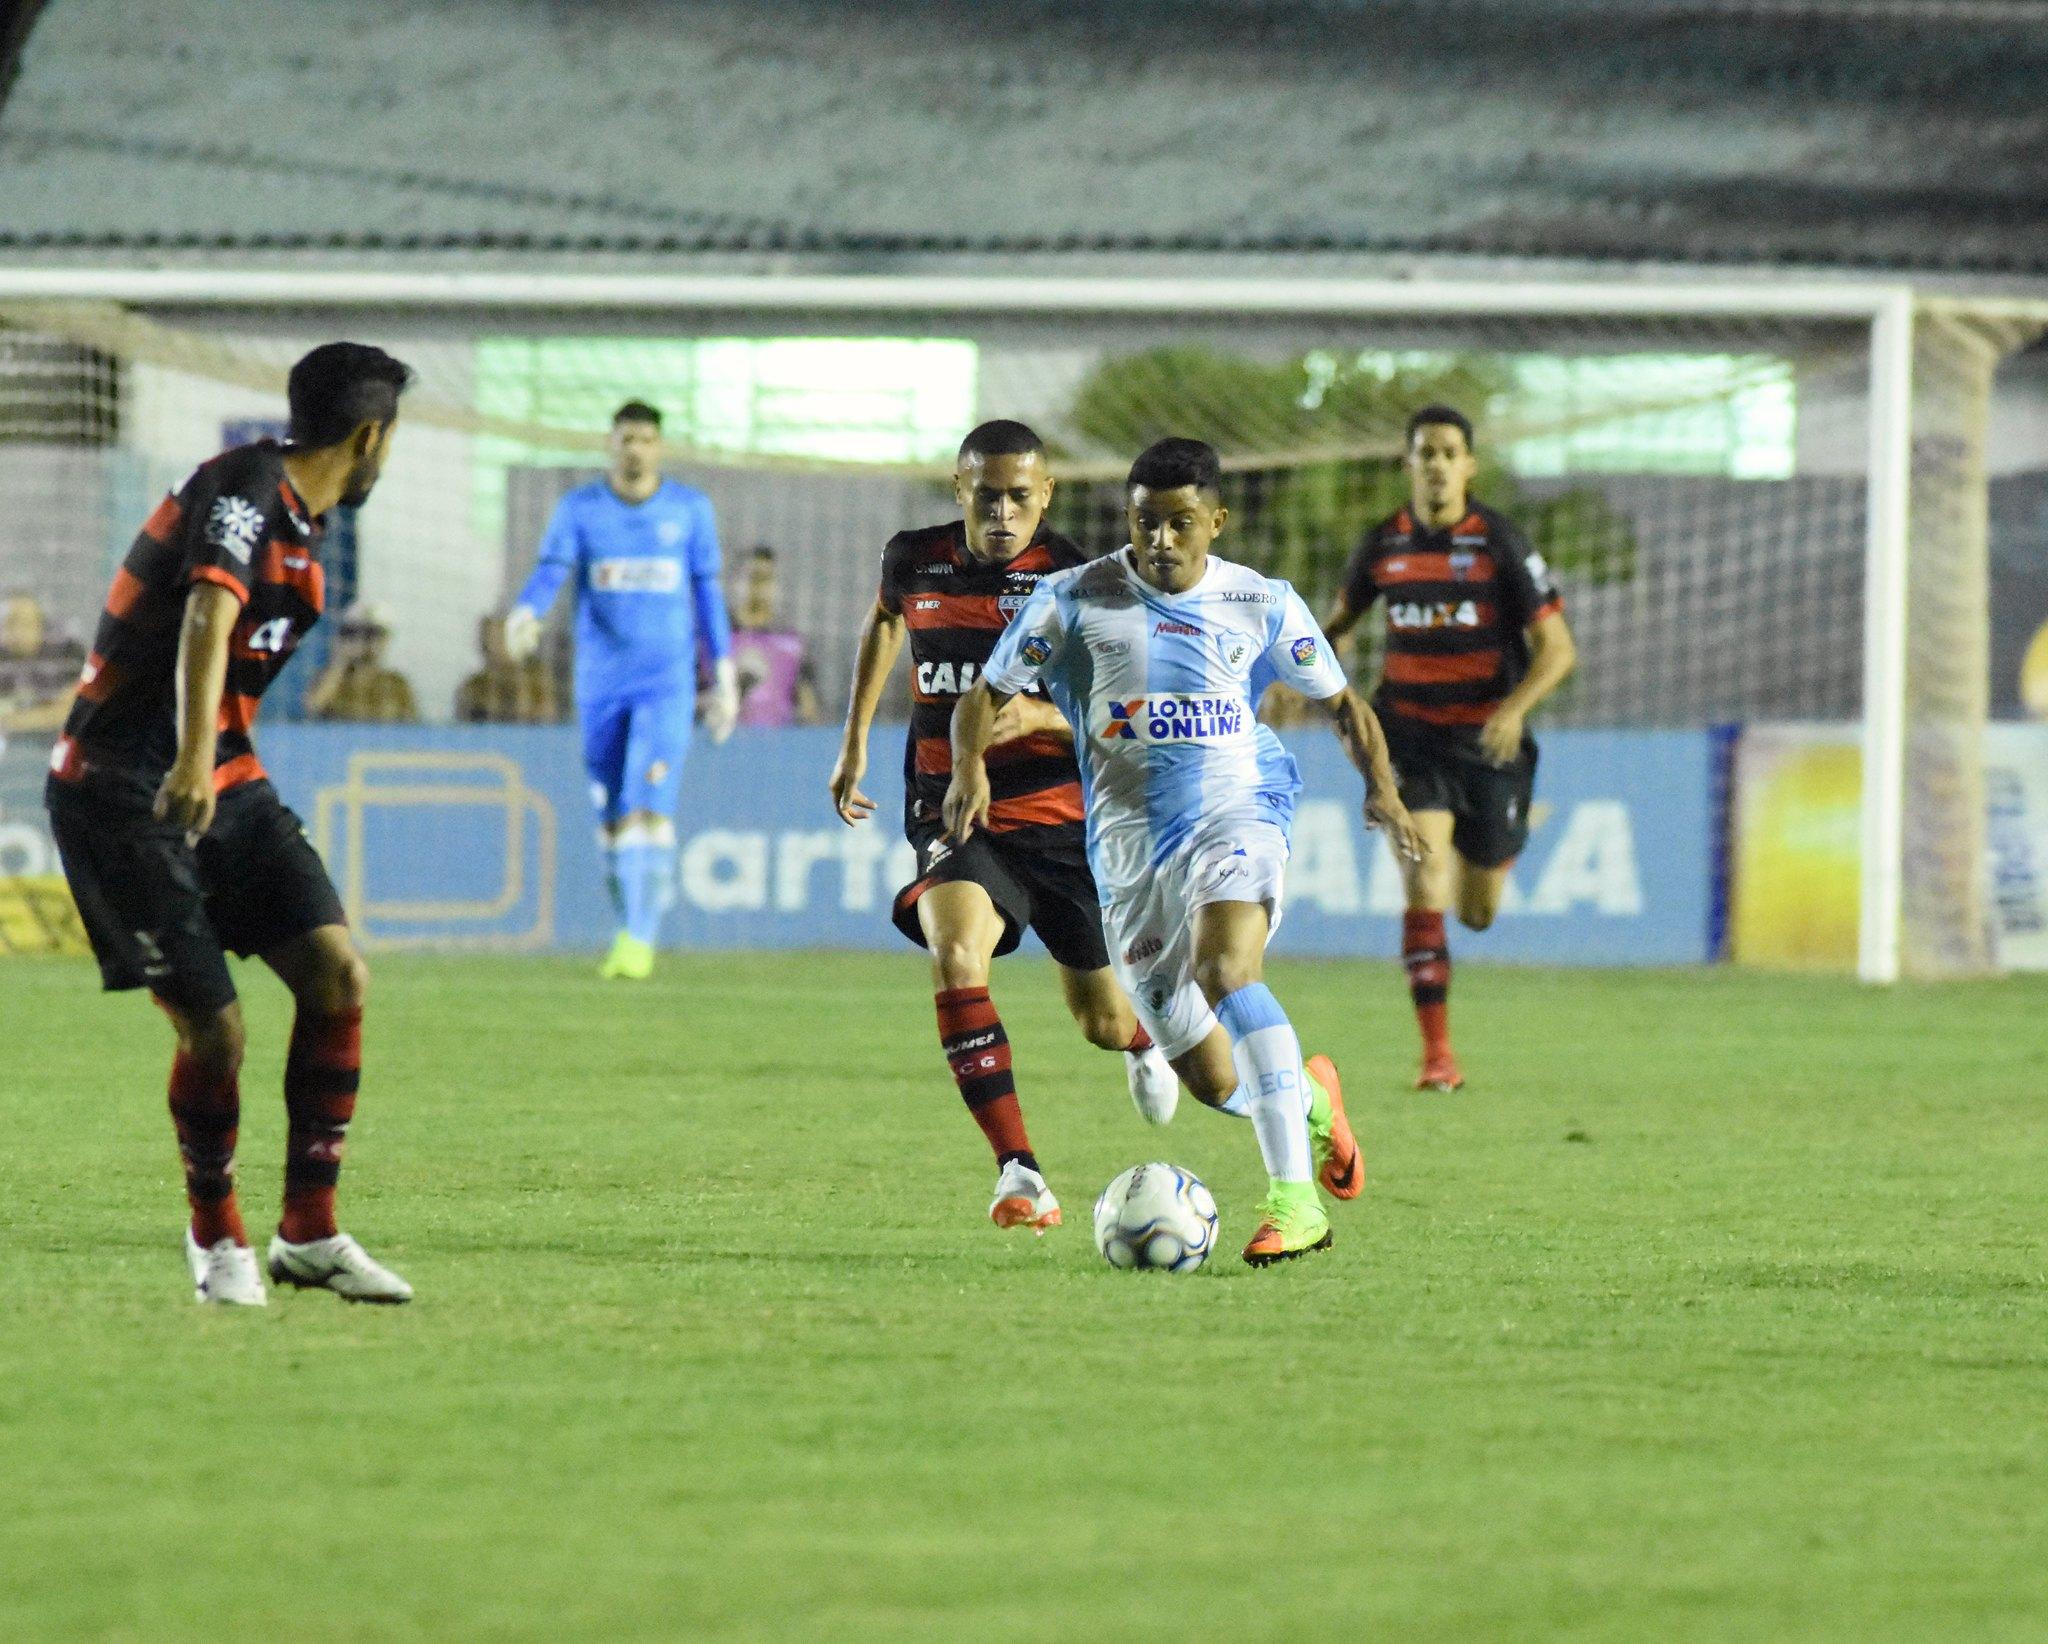 Foto  Gustavo Oliveira  Londrina Esporte Clube 3aa29fd7cda6c